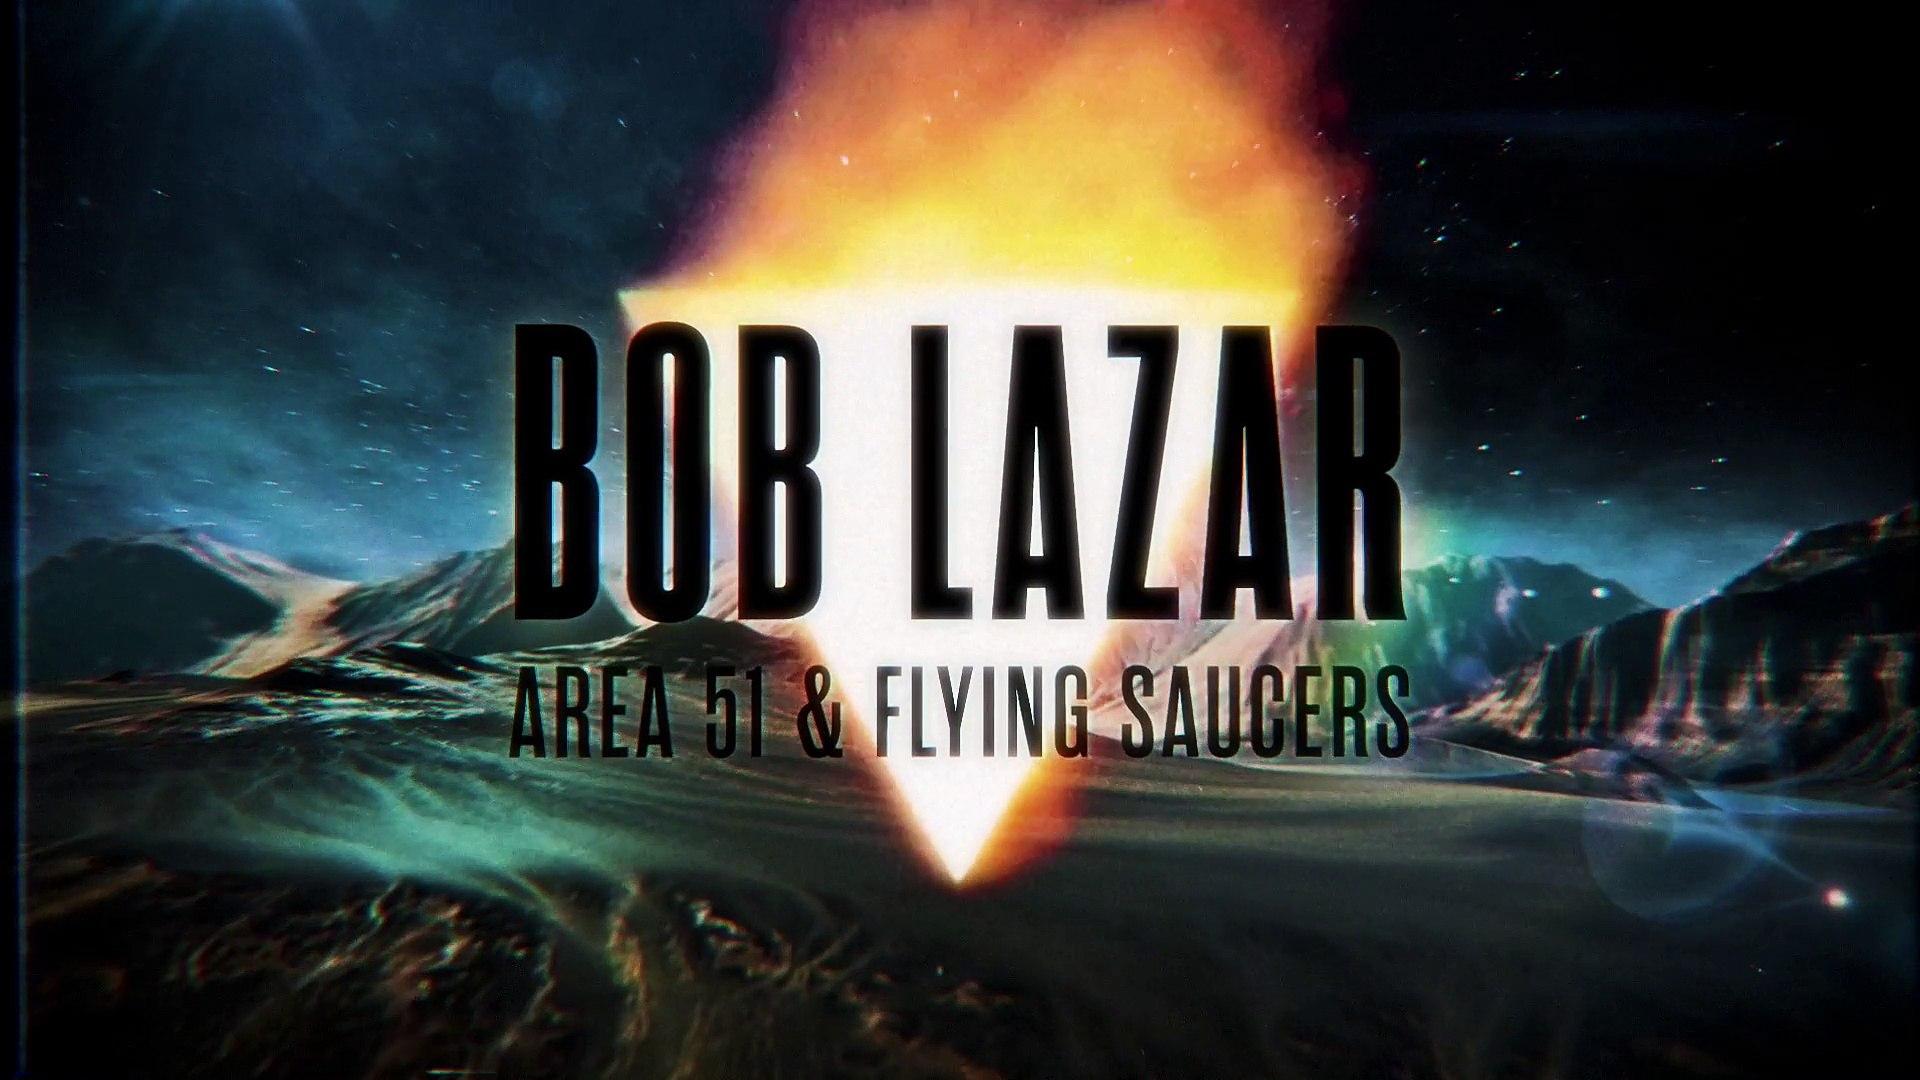 BOB LAZAR - Area 51 & Flying Saucers (EXCLUSIVE SNEAK PEEK)